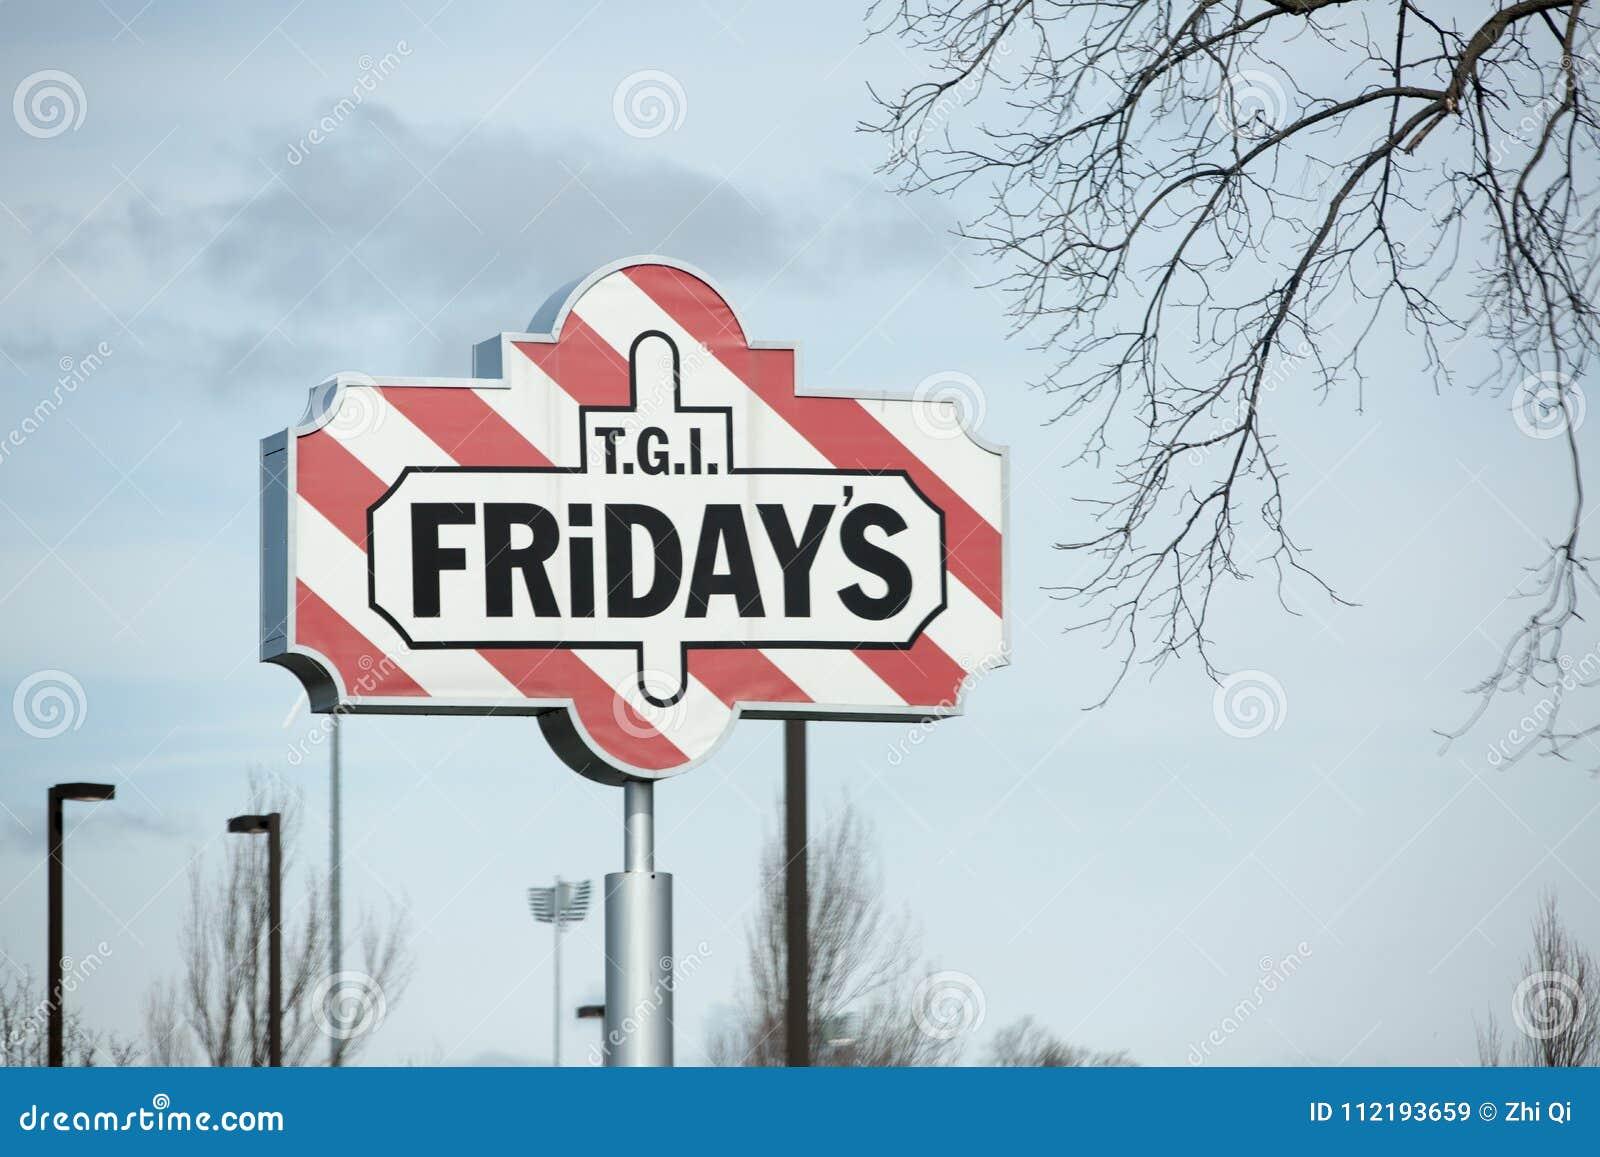 TGI Fridays Exterior And Logo  TGI Friday`s Is An American